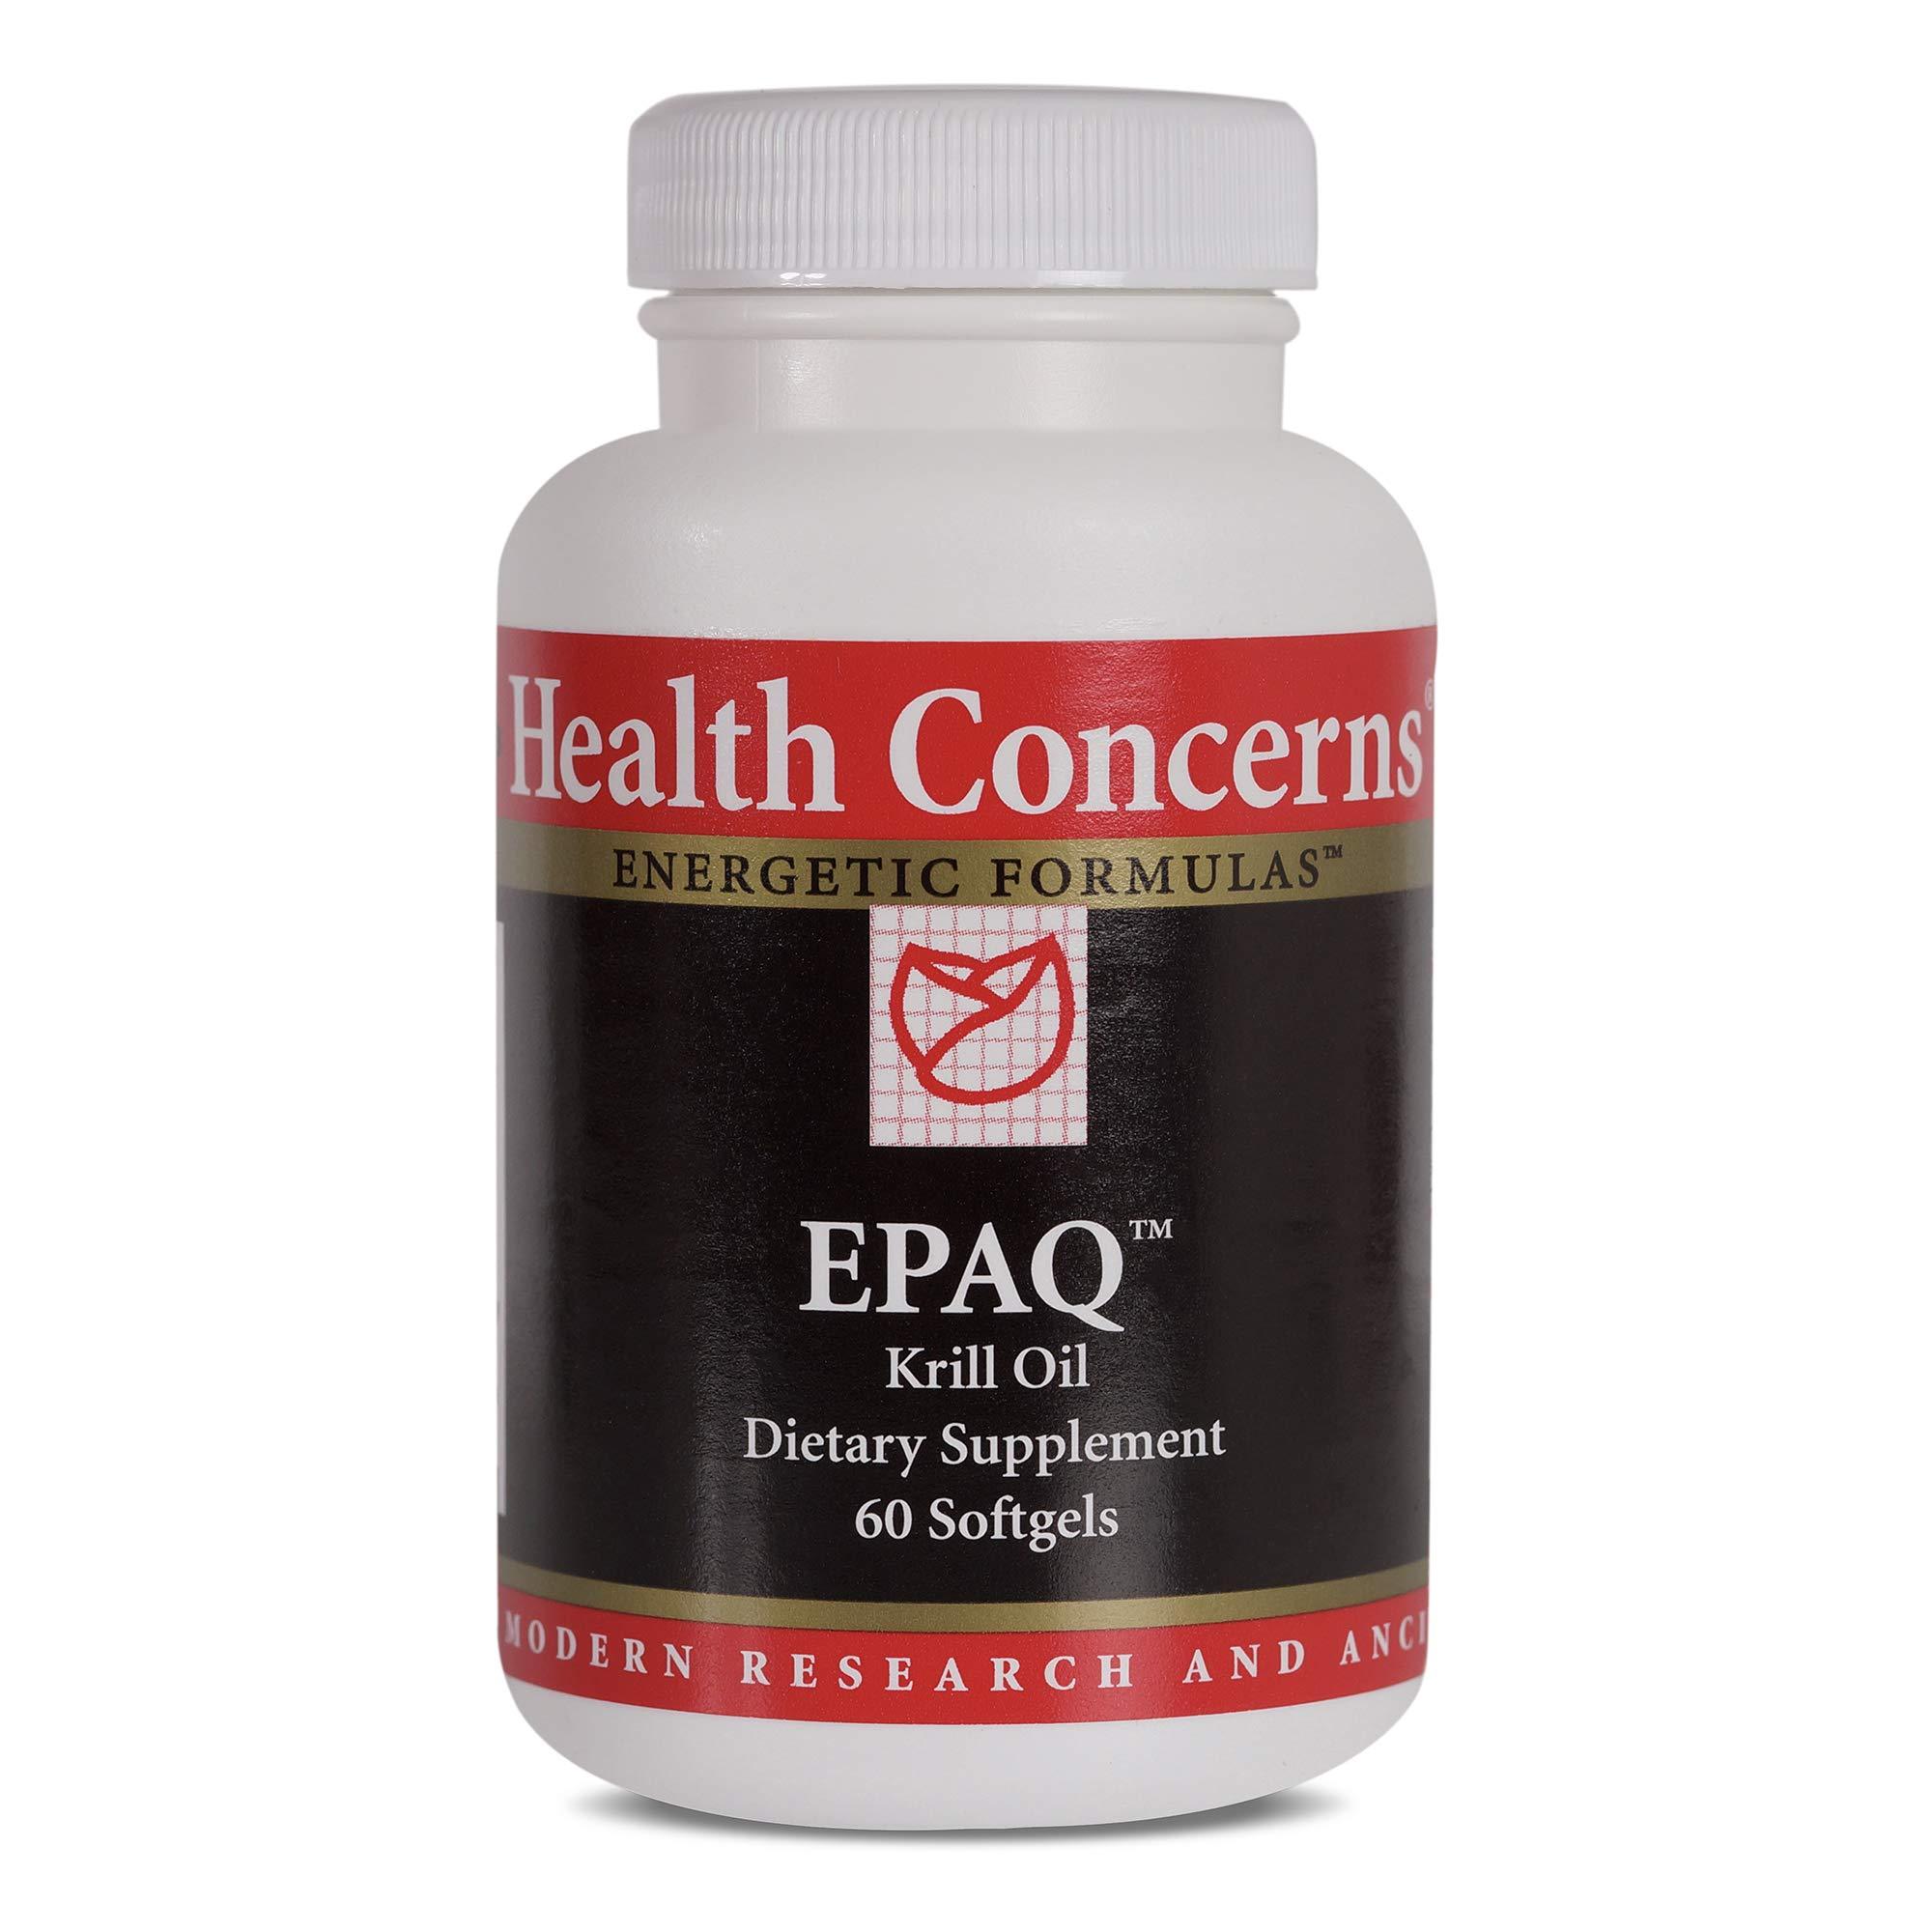 Health Concerns - EPAQ - Krill Oil Dietary Supplement - 60 Softgels